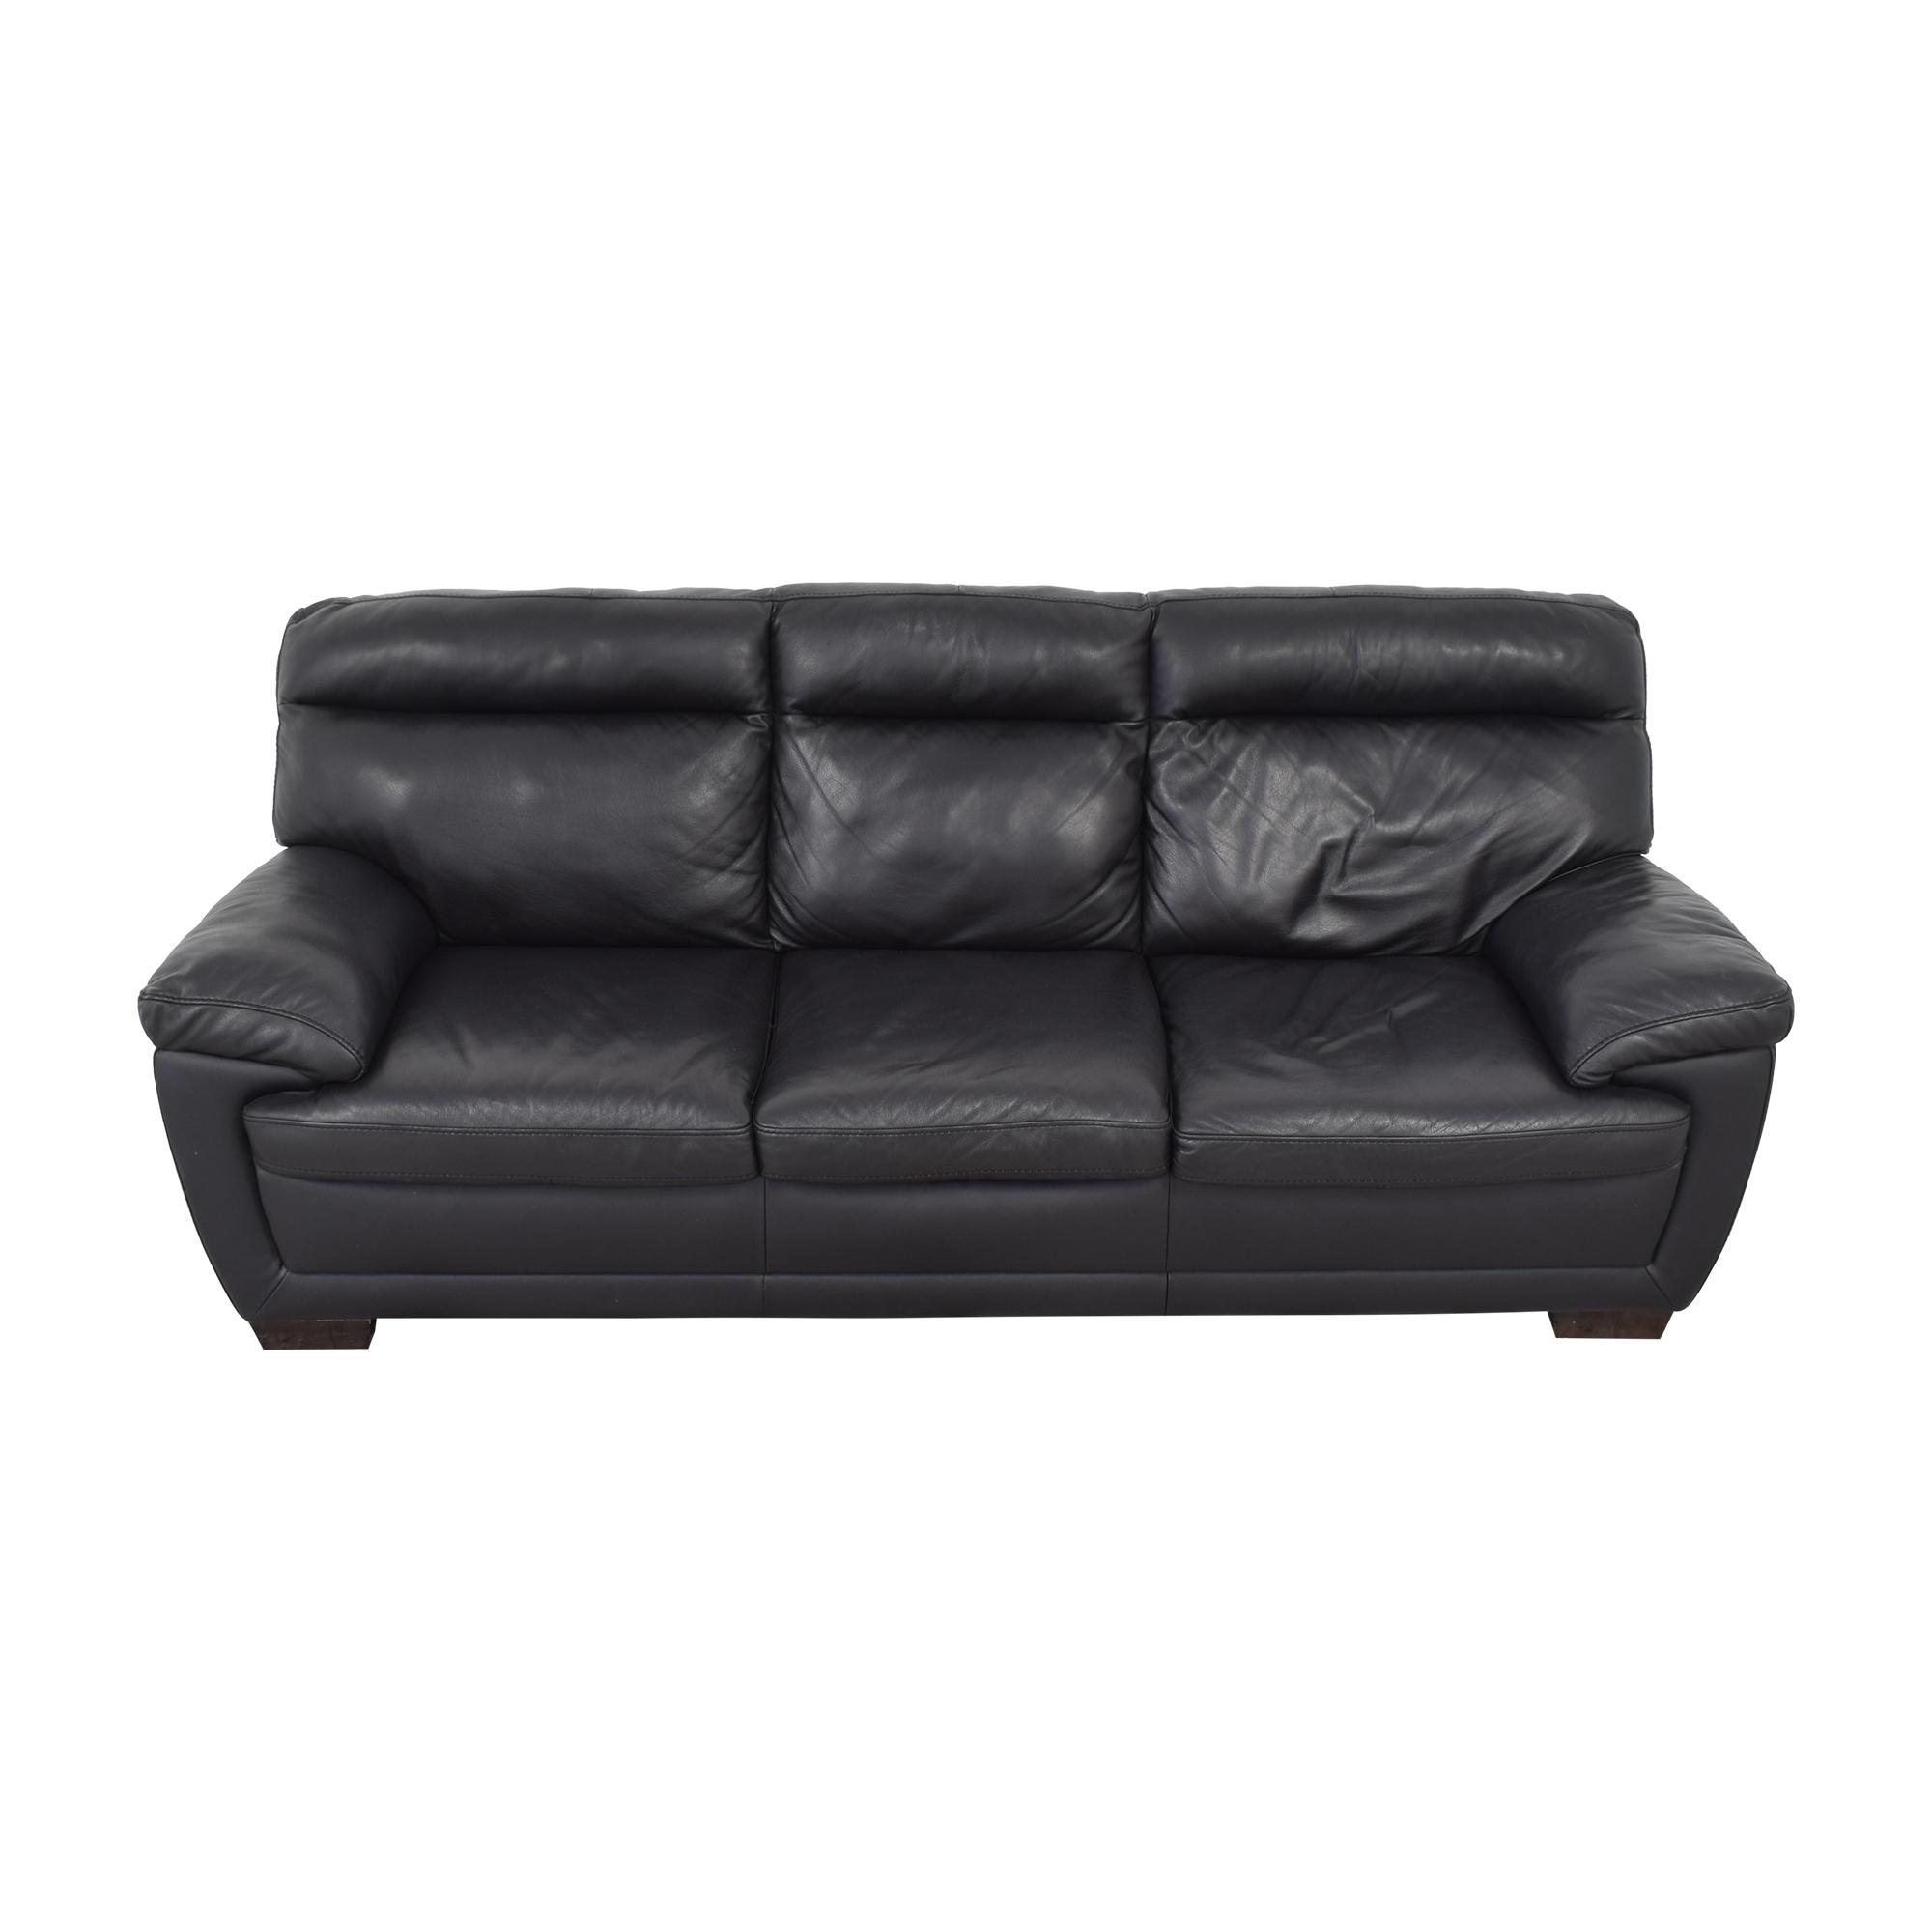 Macy's Three Cushion Sofa sale